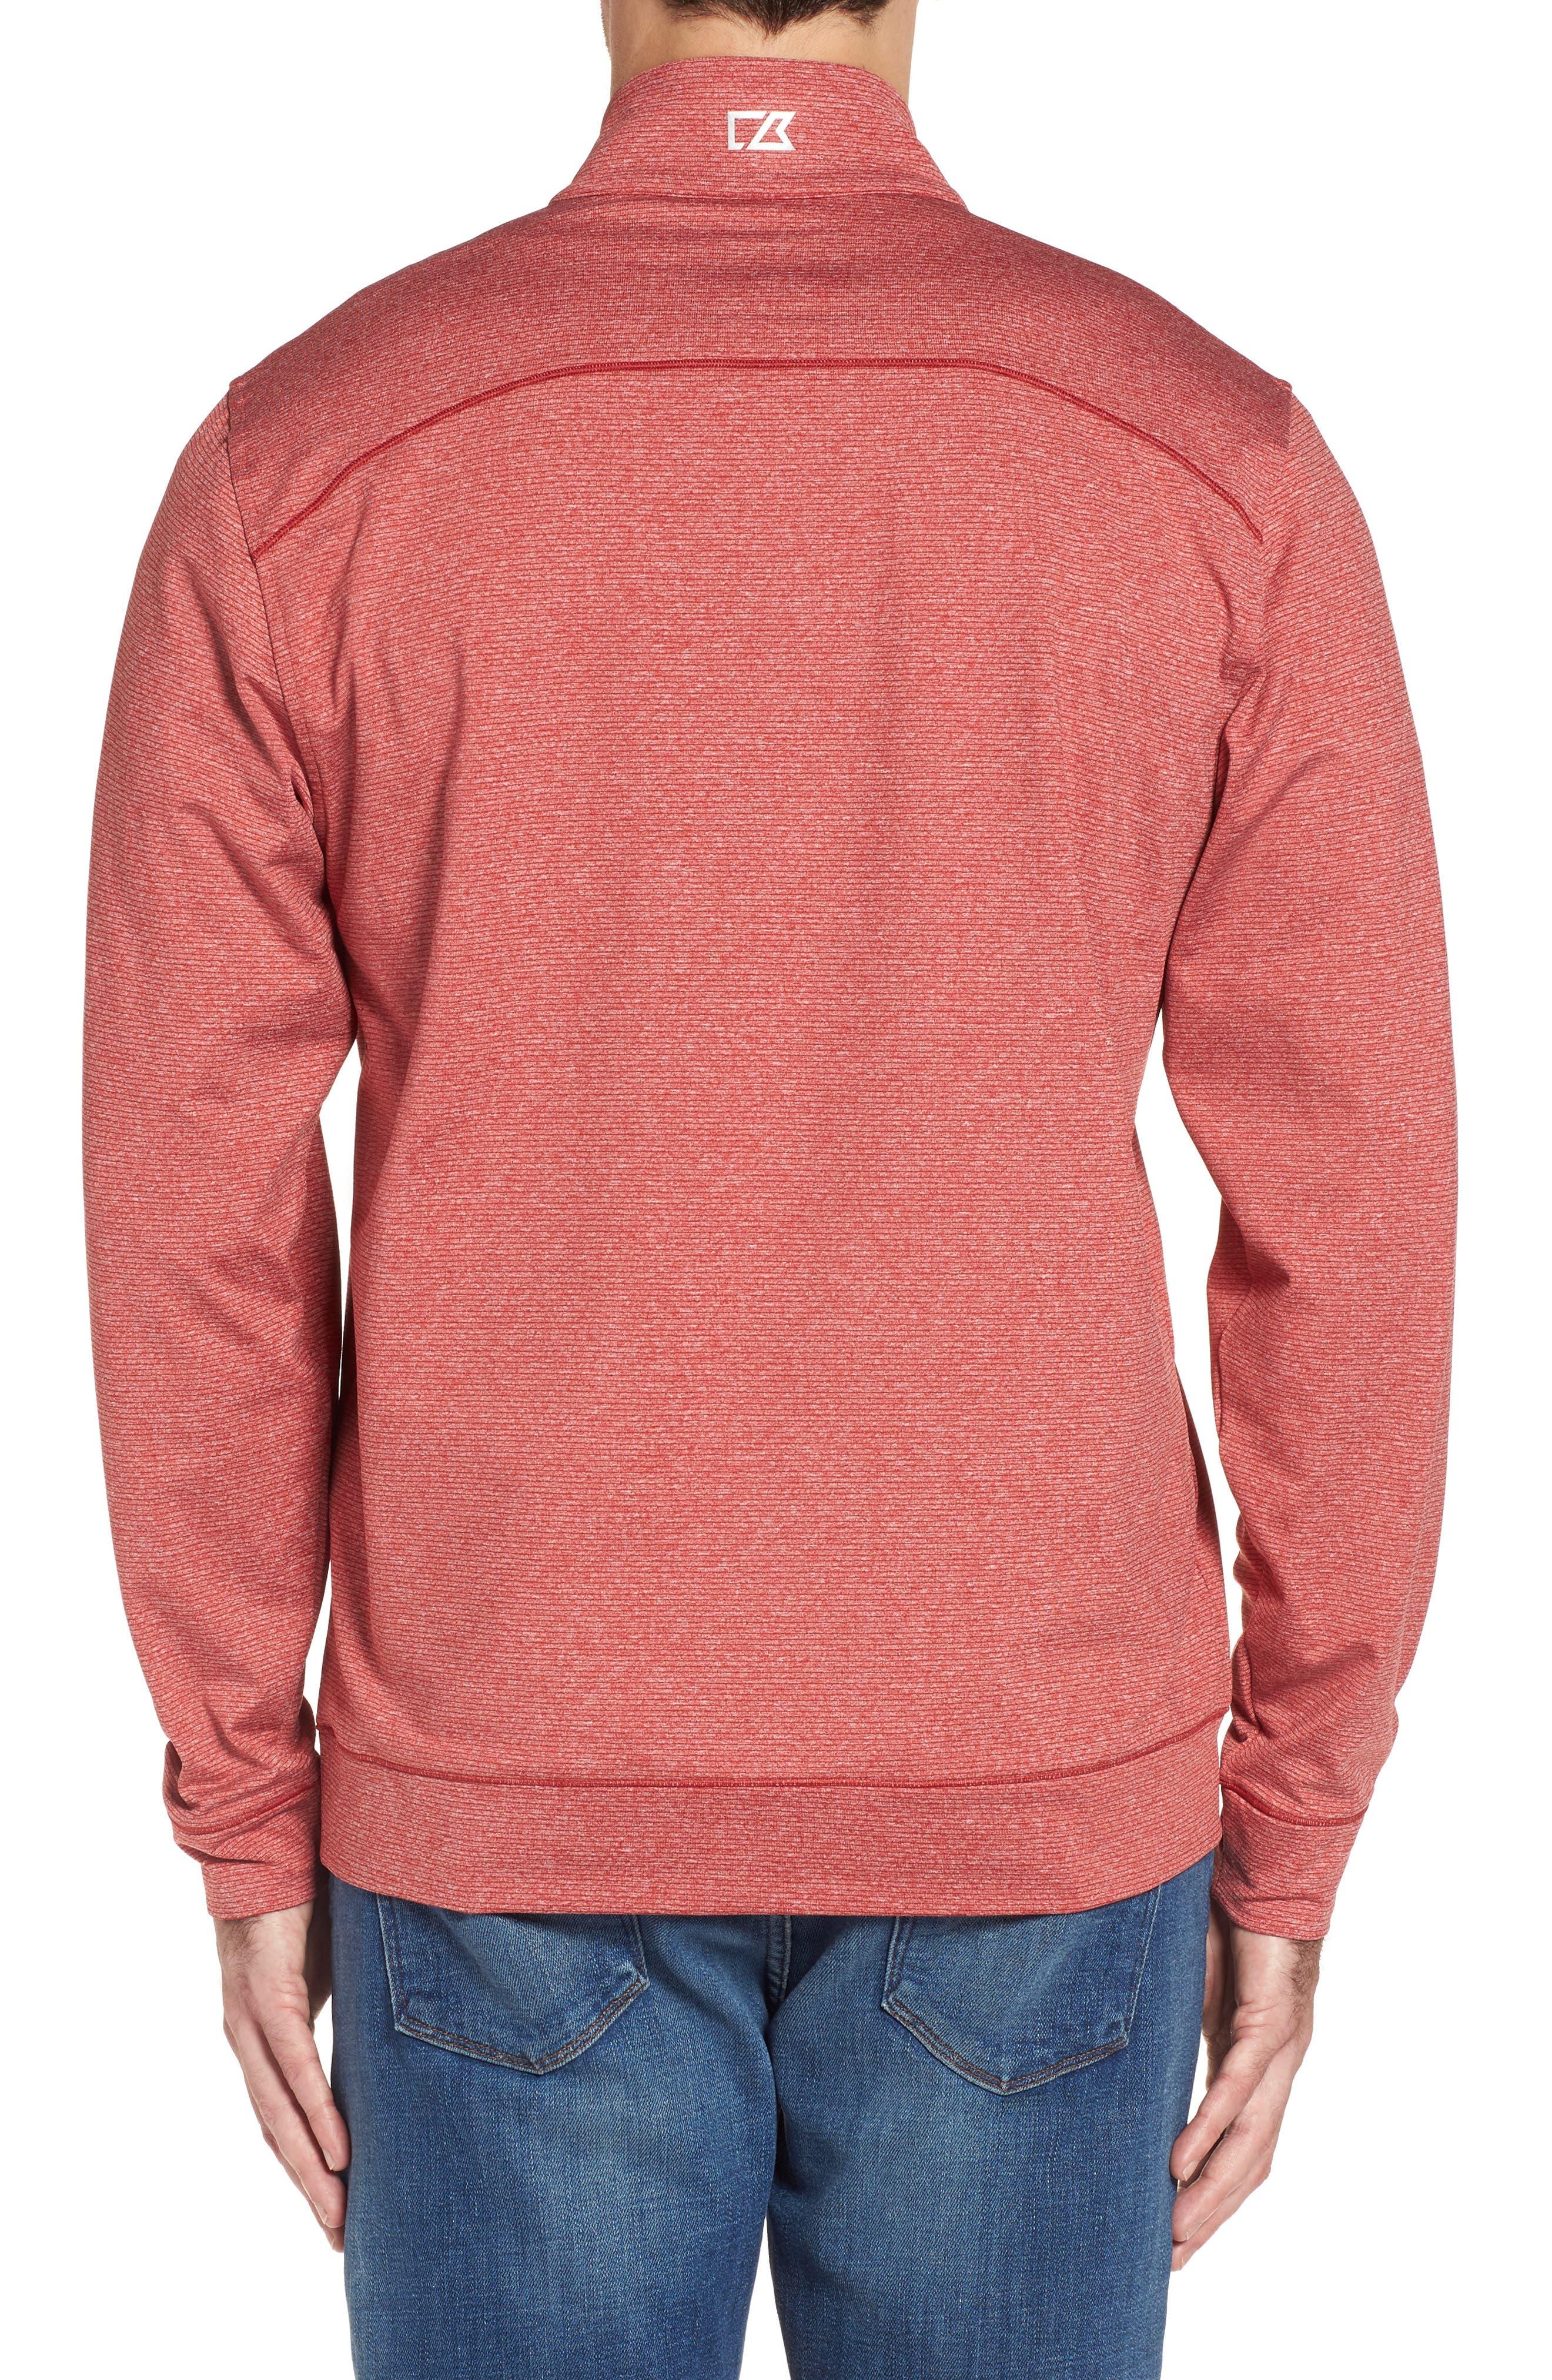 Shoreline - Tampa Bay Buccaneers Half Zip Pullover,                             Alternate thumbnail 2, color,                             Cardinal Red Heather